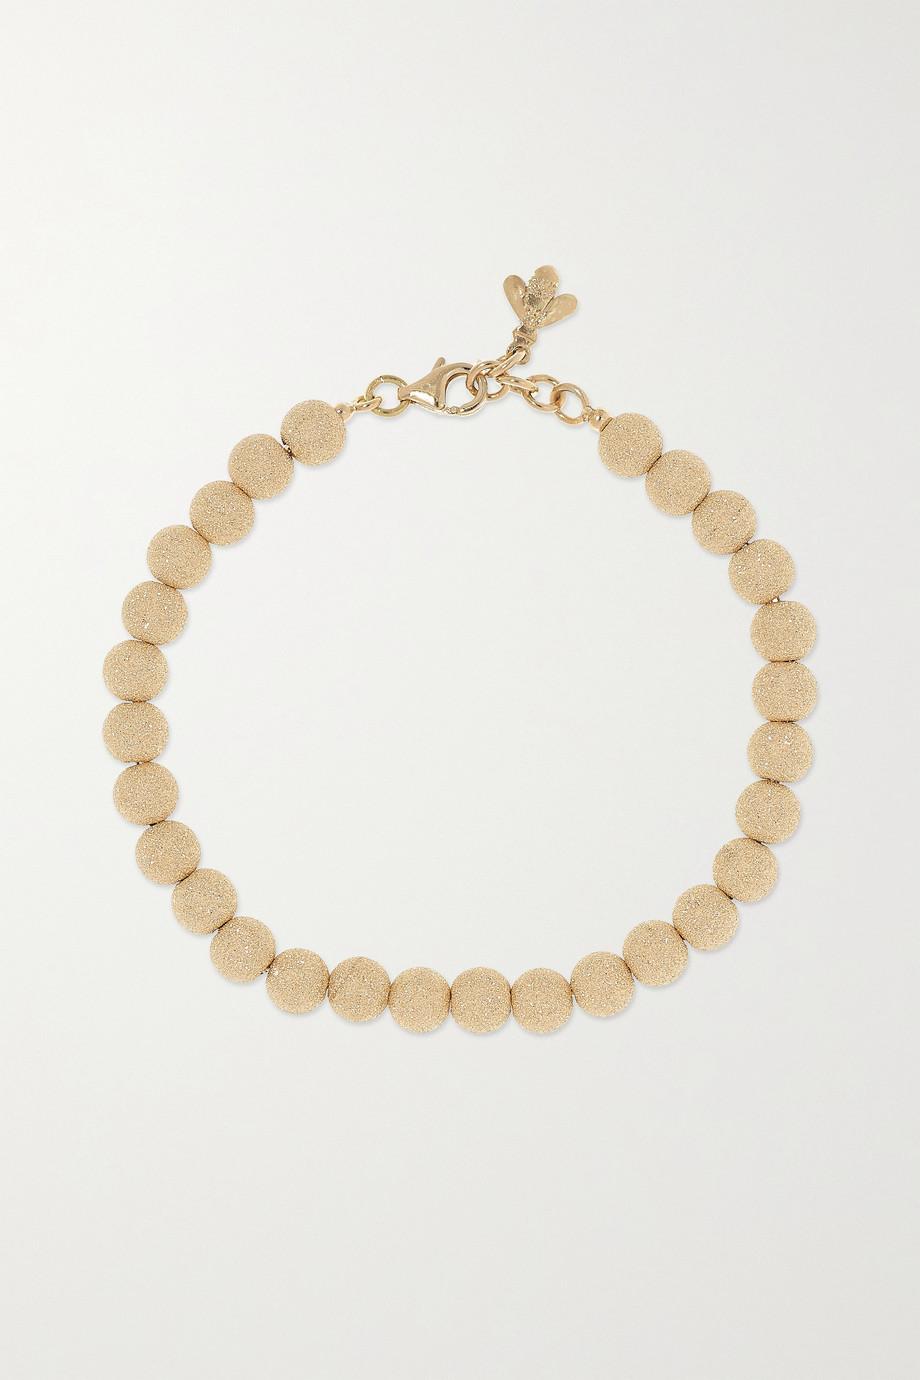 Carolina Bucci Florentine 18-karat gold beaded bracelet